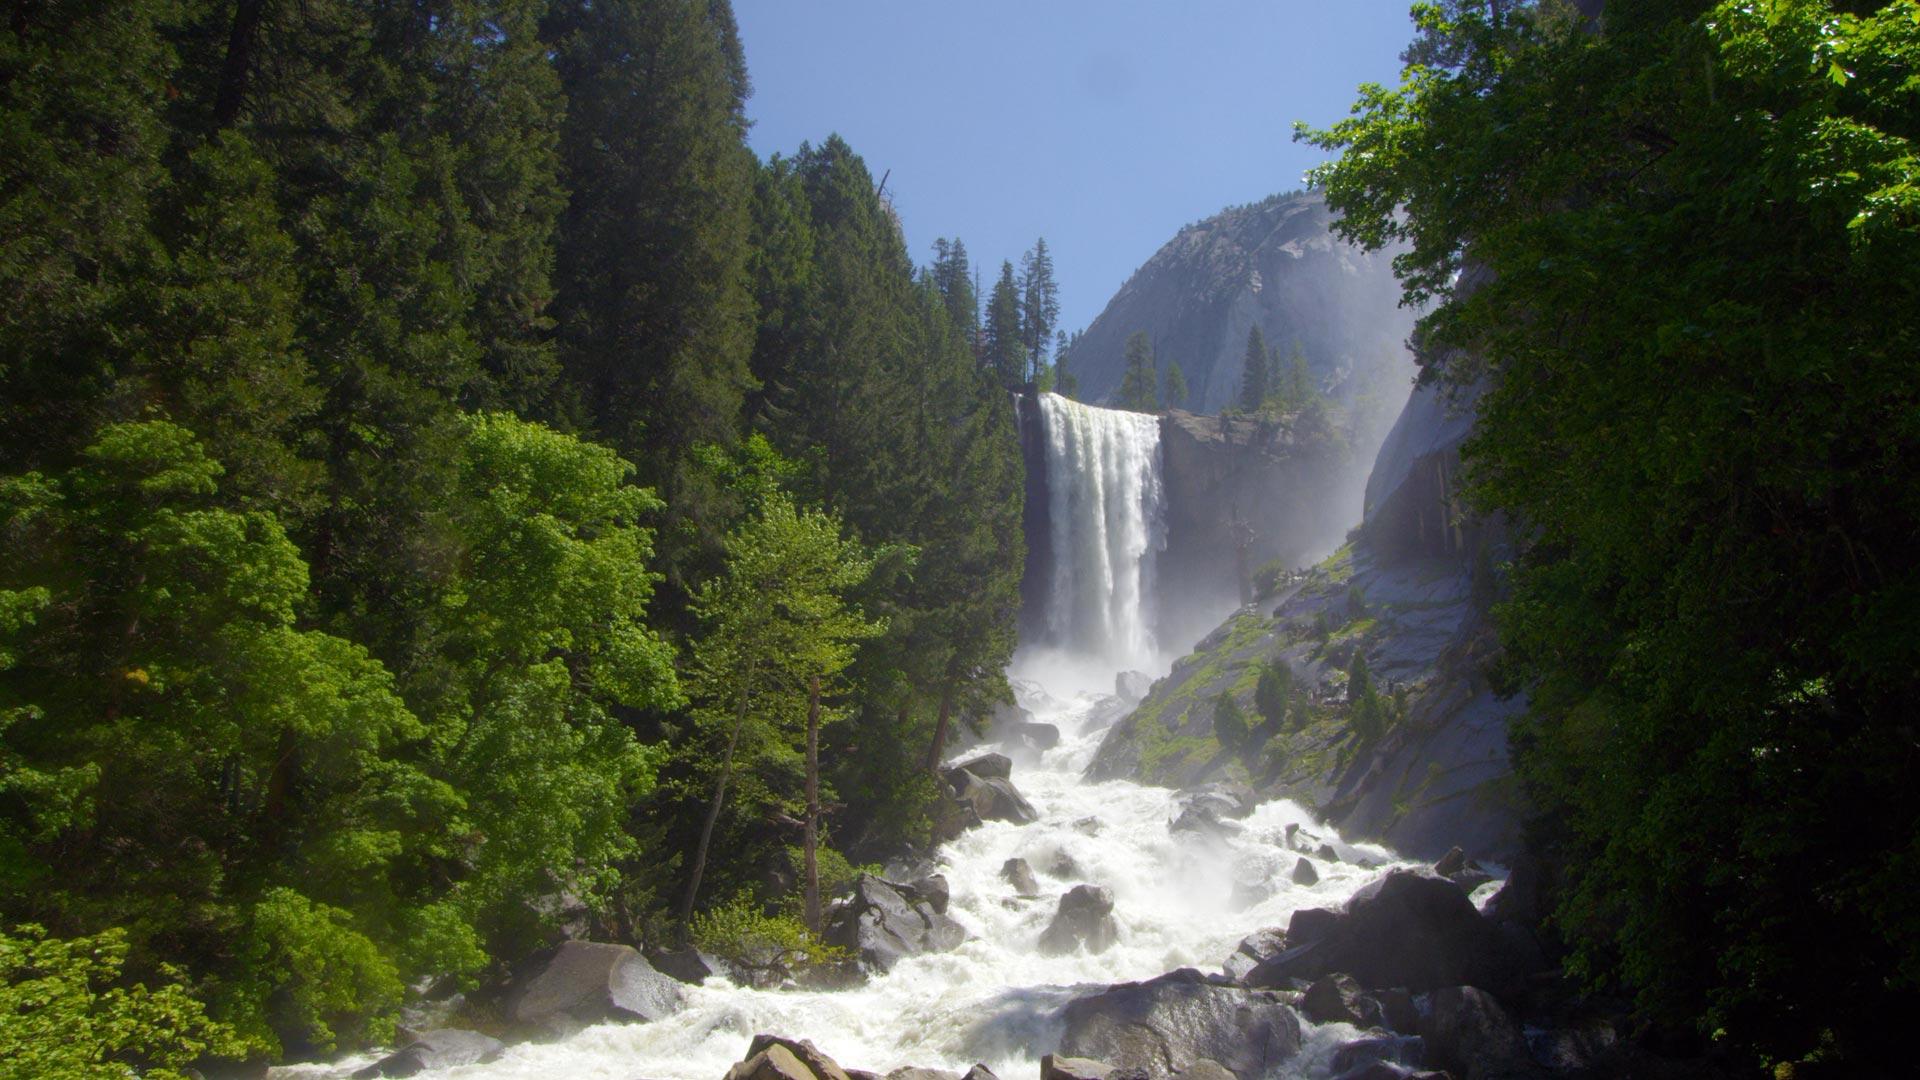 Yosemite National Park Photos and Videos -